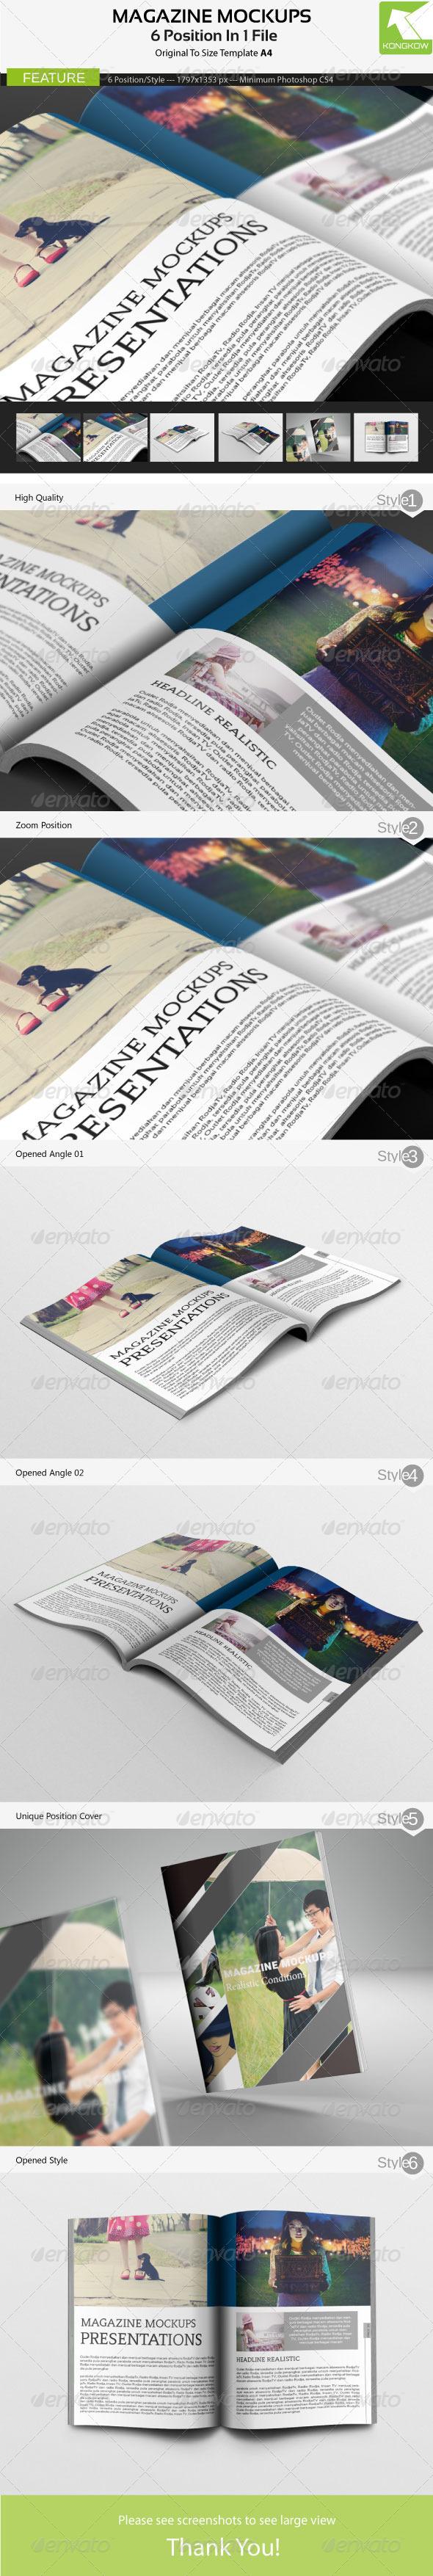 GraphicRiver Magazine Mockups 4795792